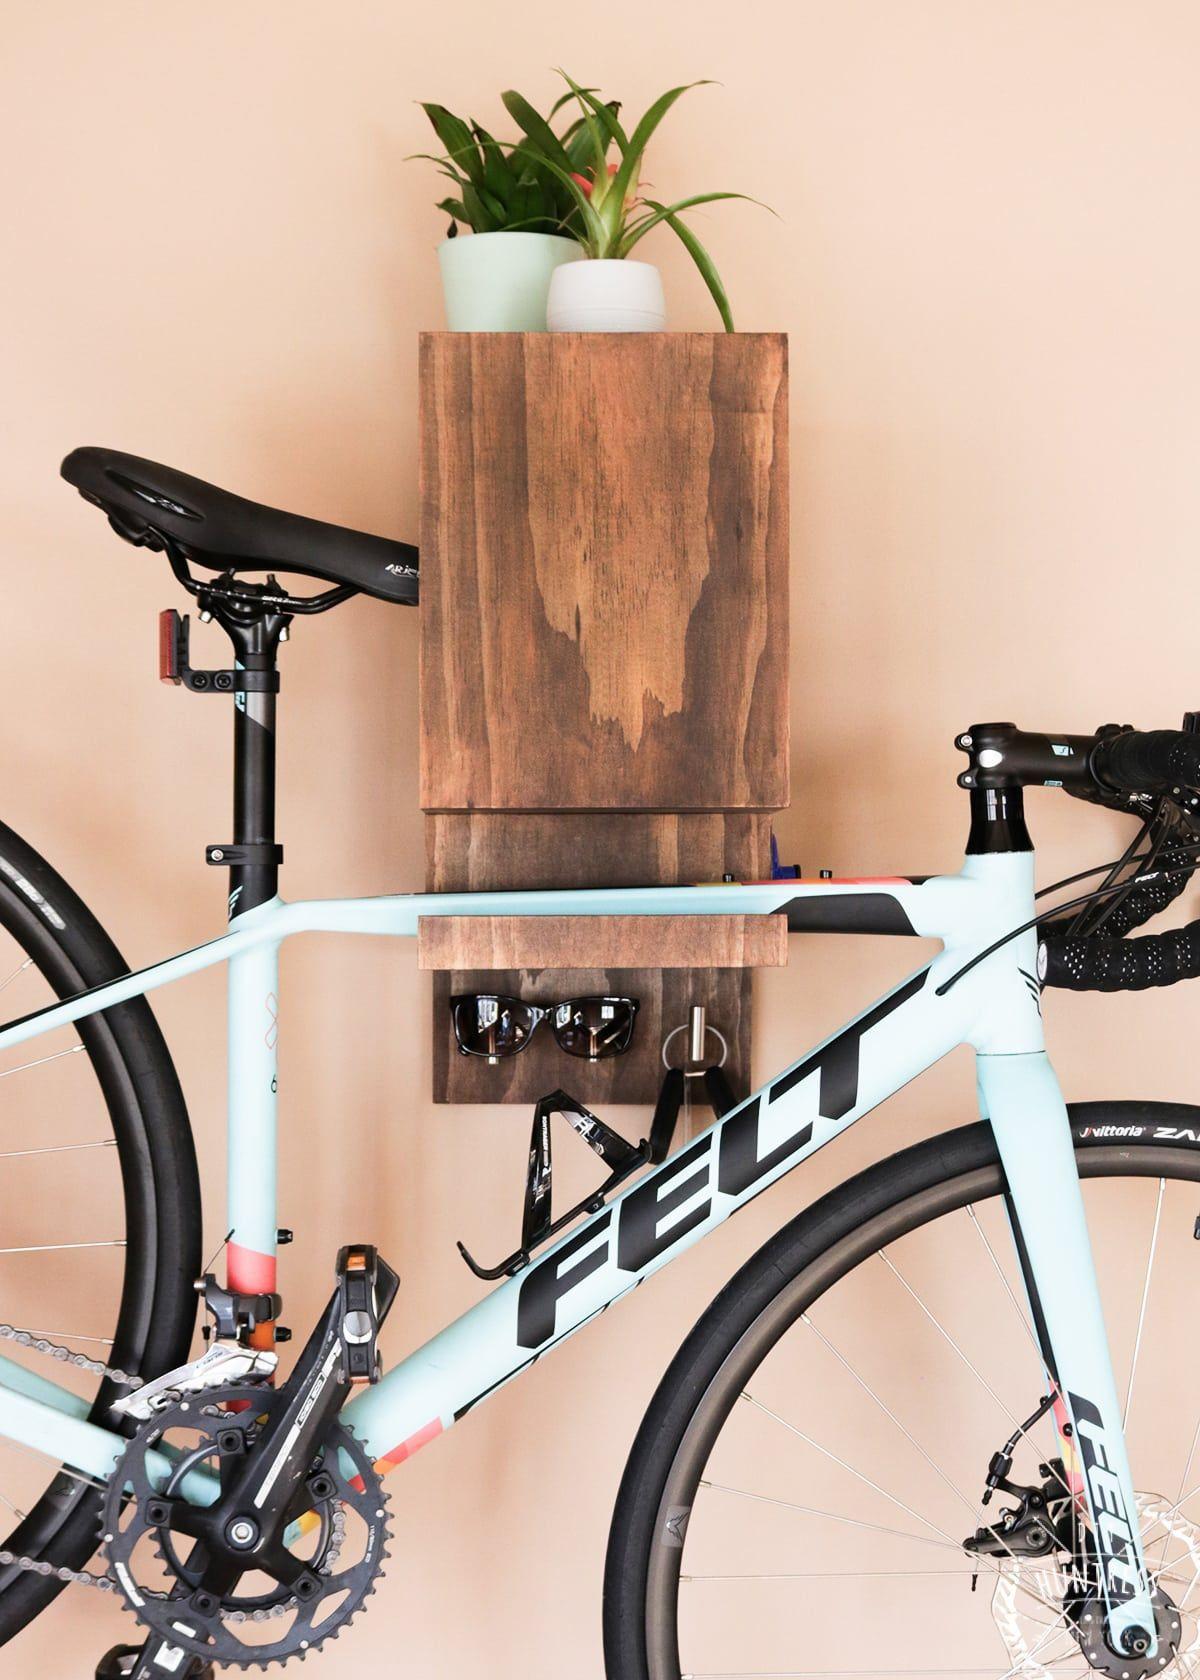 Diy Wall Mounted Bike Rack Diy Bike Rack Bike Wall Mount Bike